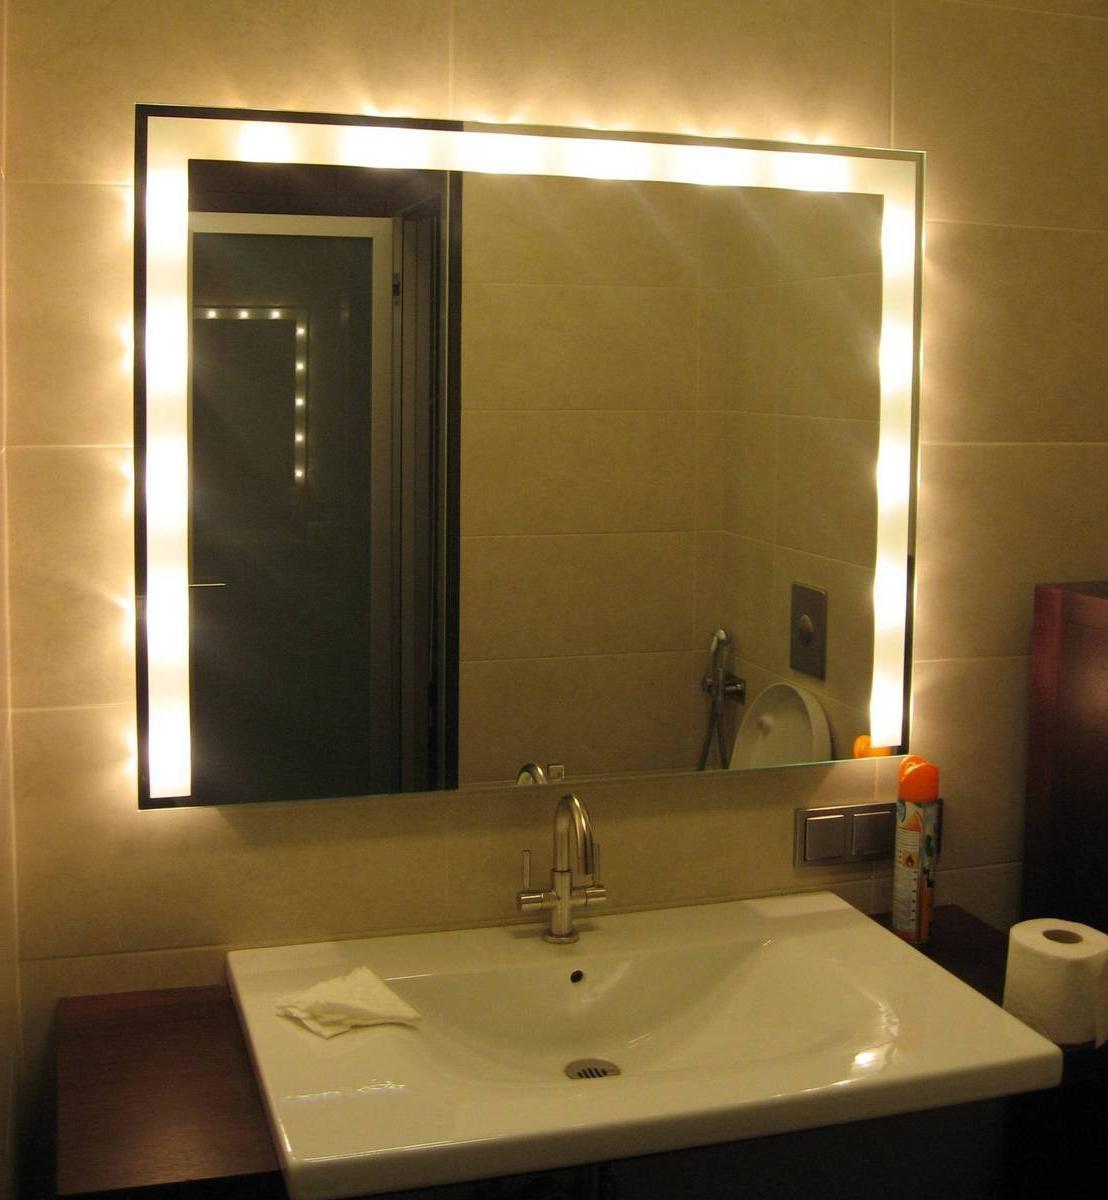 Surprising Led Bathroom Vanity Light Vanity Lights Walmart Mirror With Regard To Lights For Bathroom Mirrors (View 12 of 20)